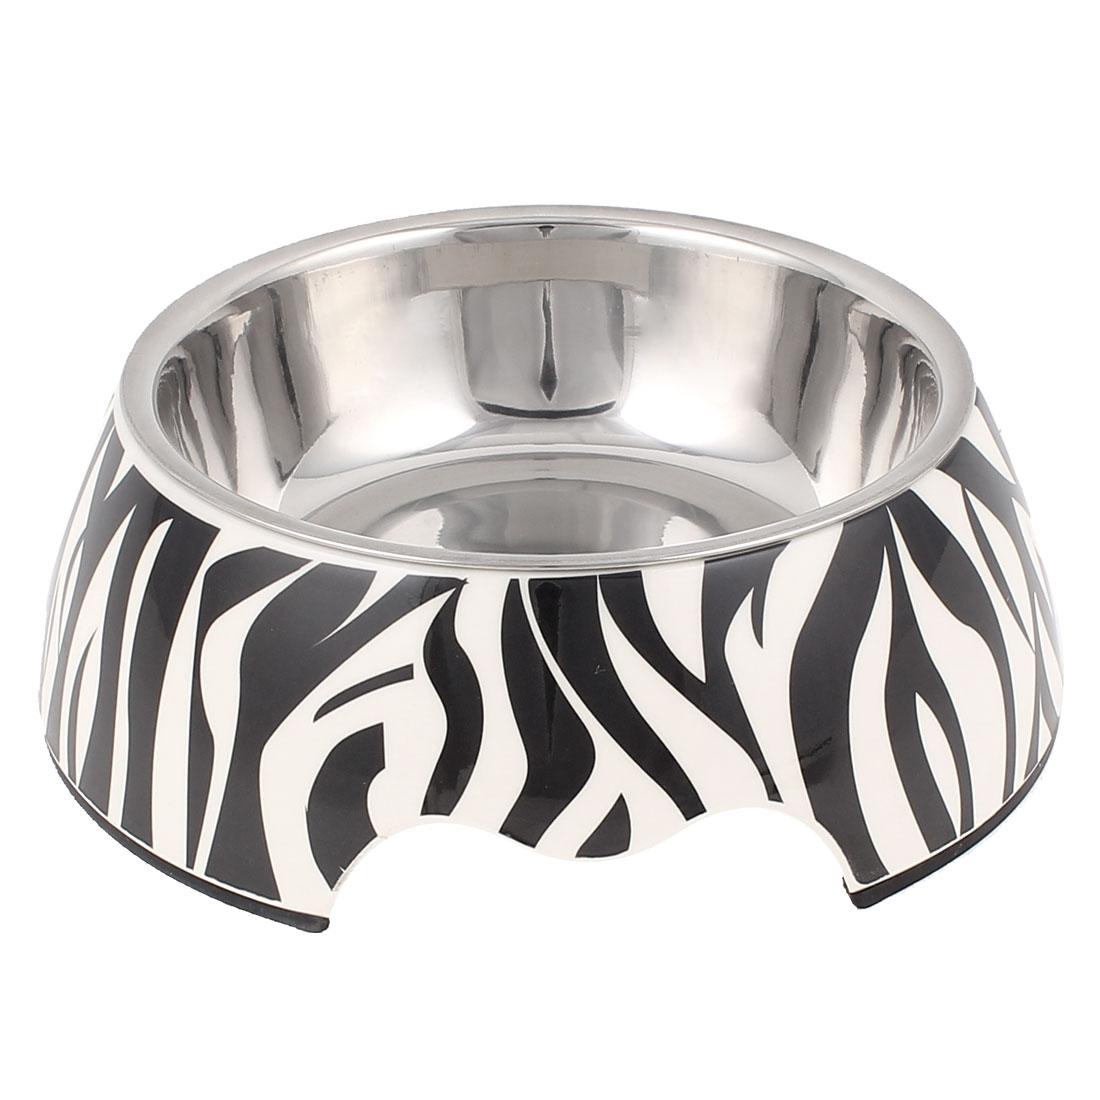 Pet Cat Doggie Plastic Zebra Pattern Dish Food Water Feeding Feeder Bowl